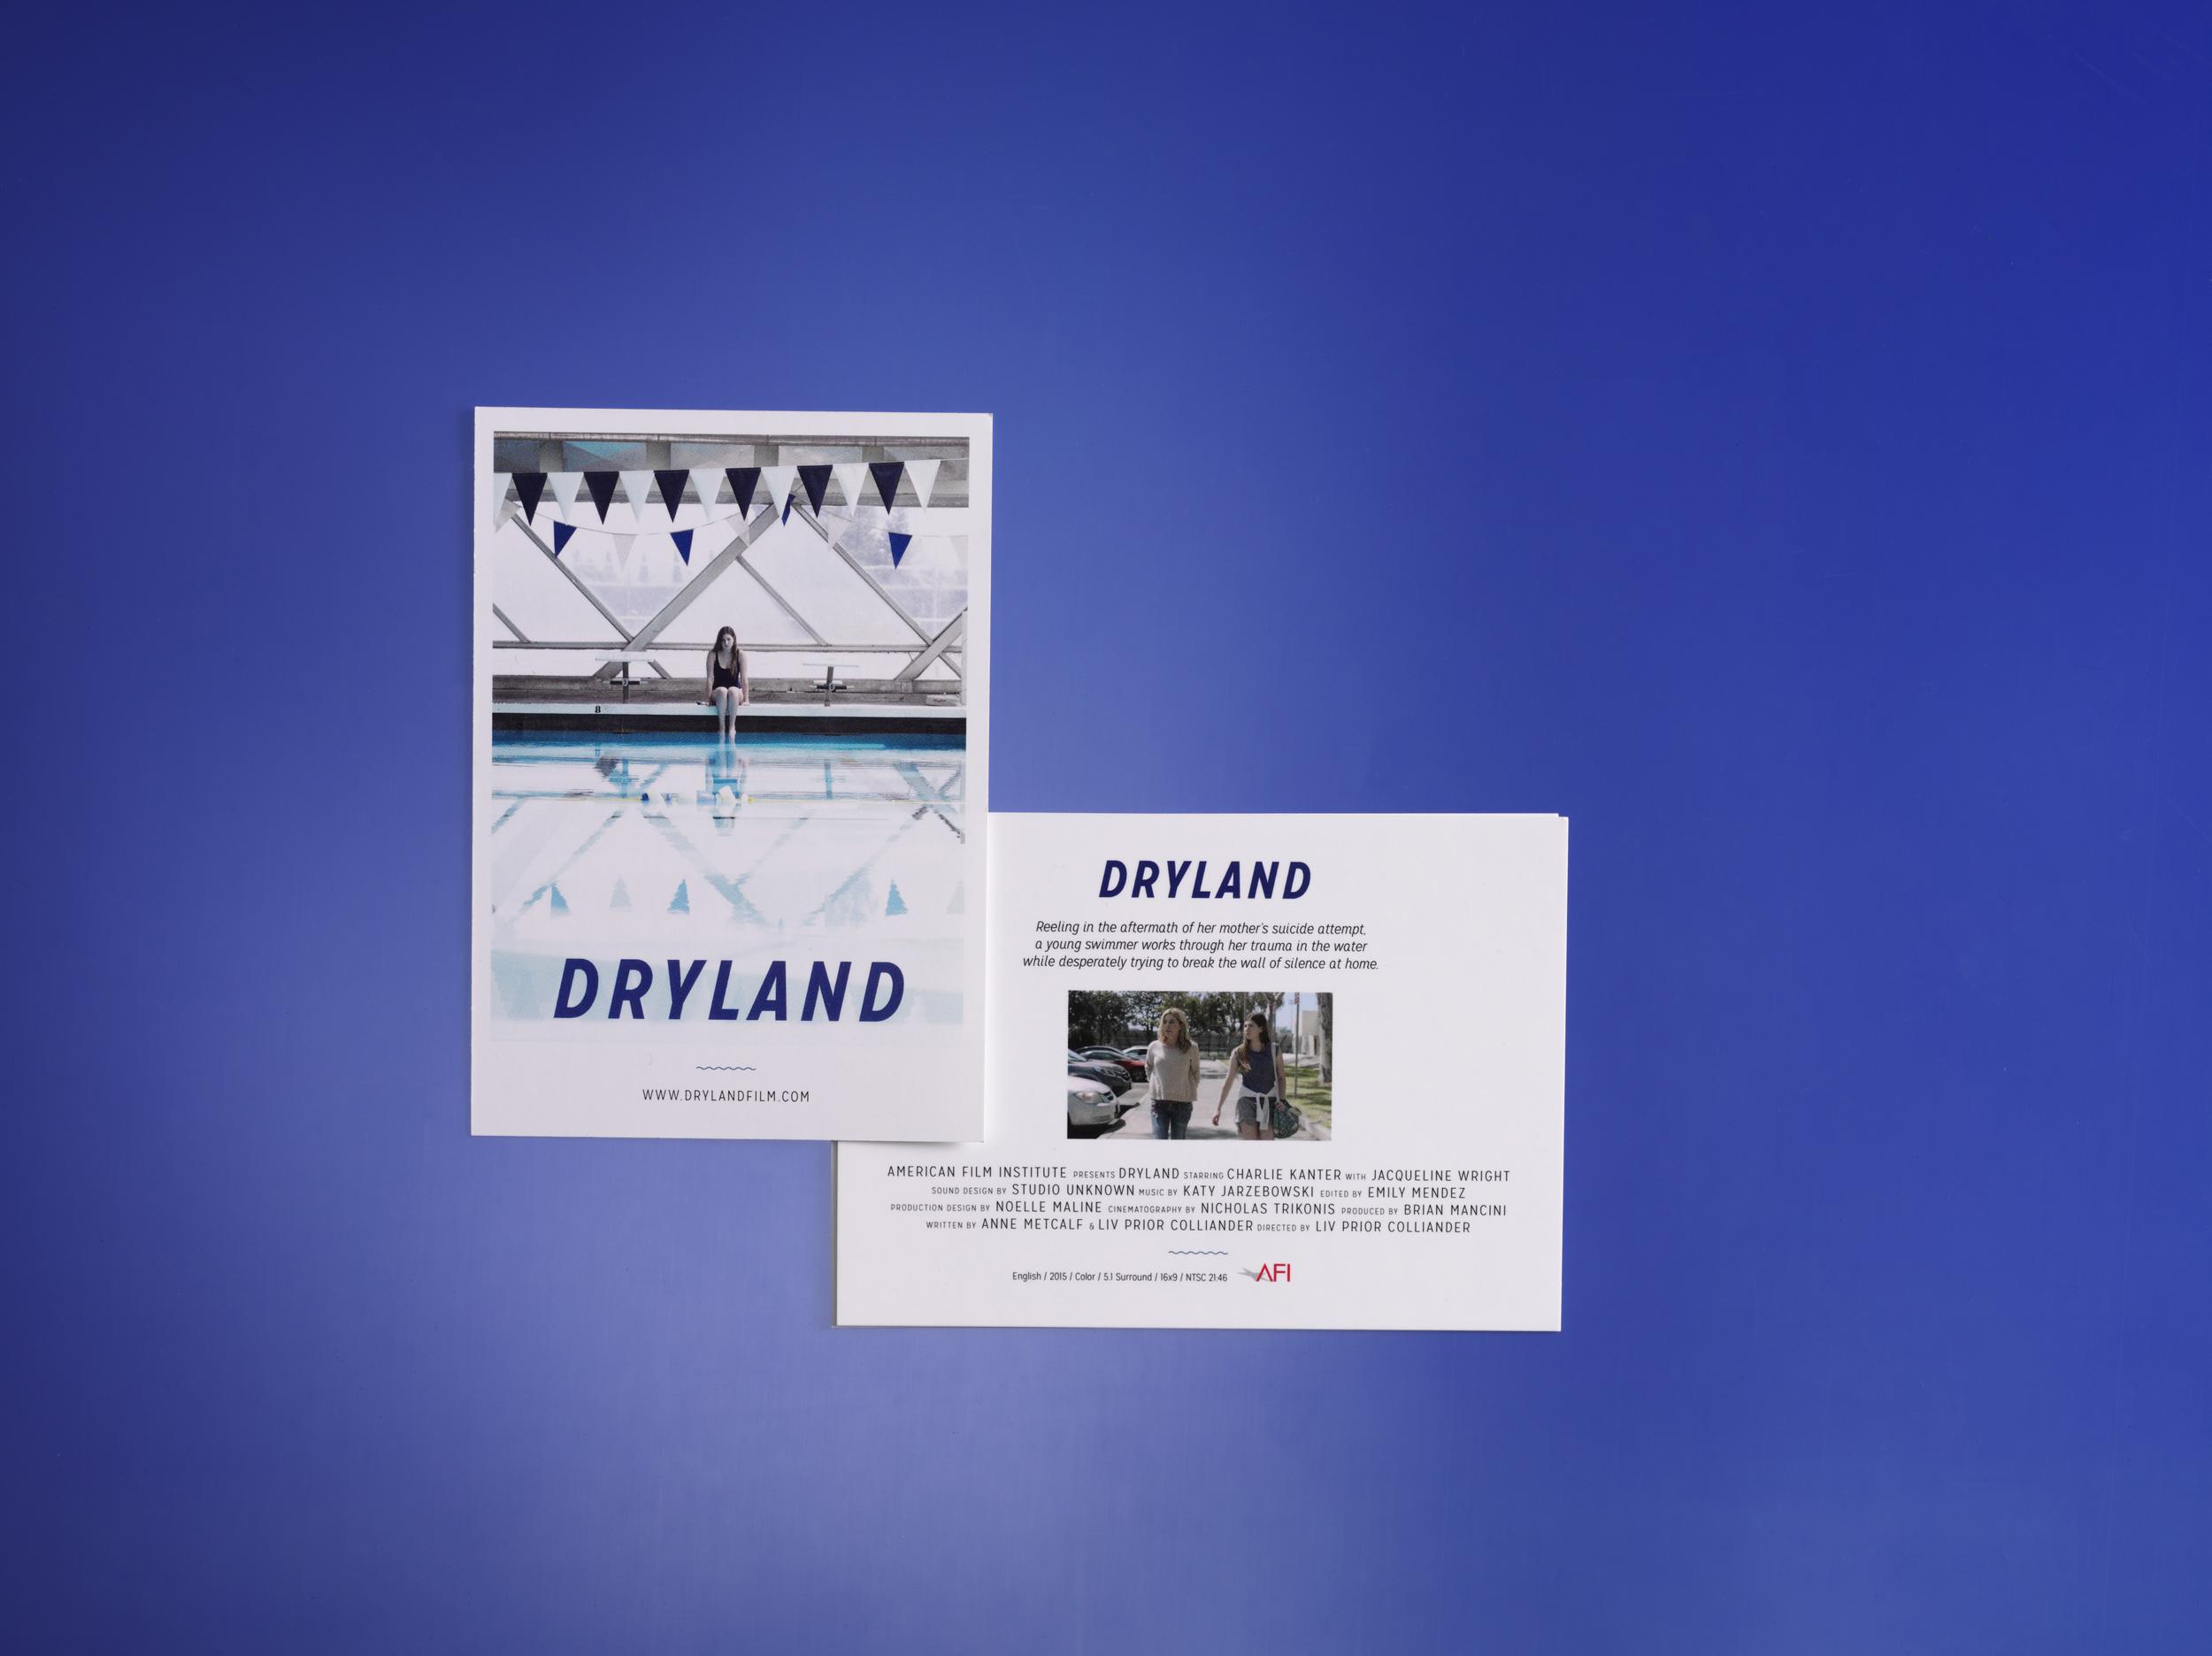 dryland_postcard_layout.jpg